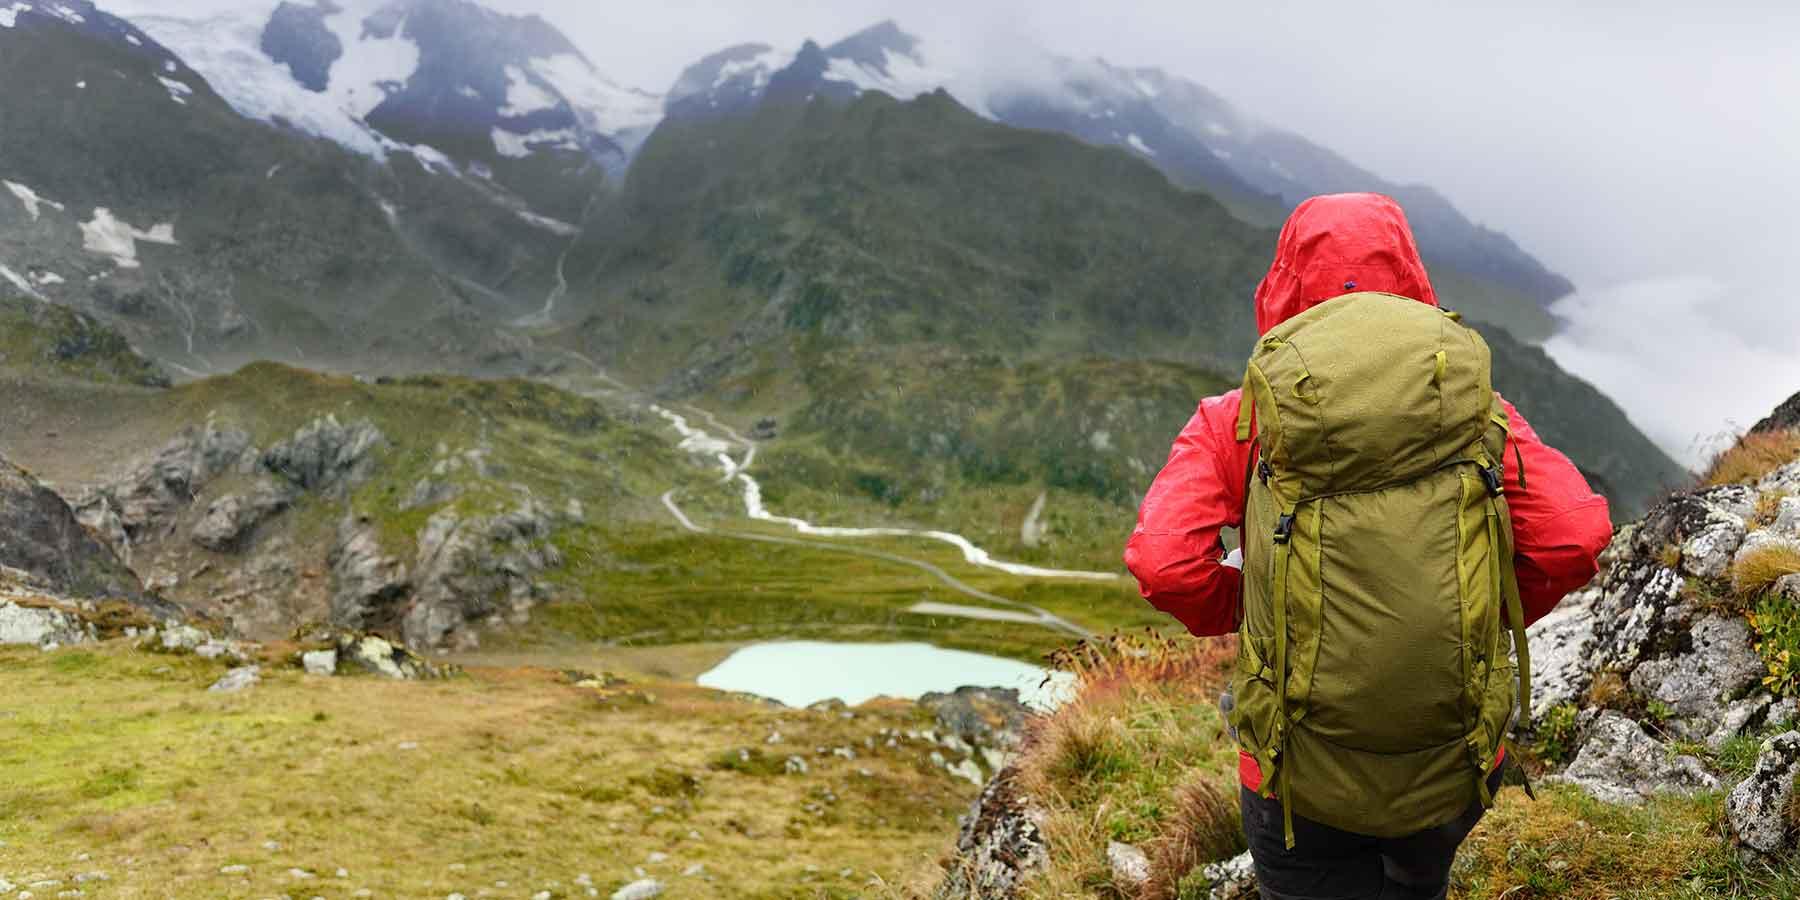 Trekking uphill struggle